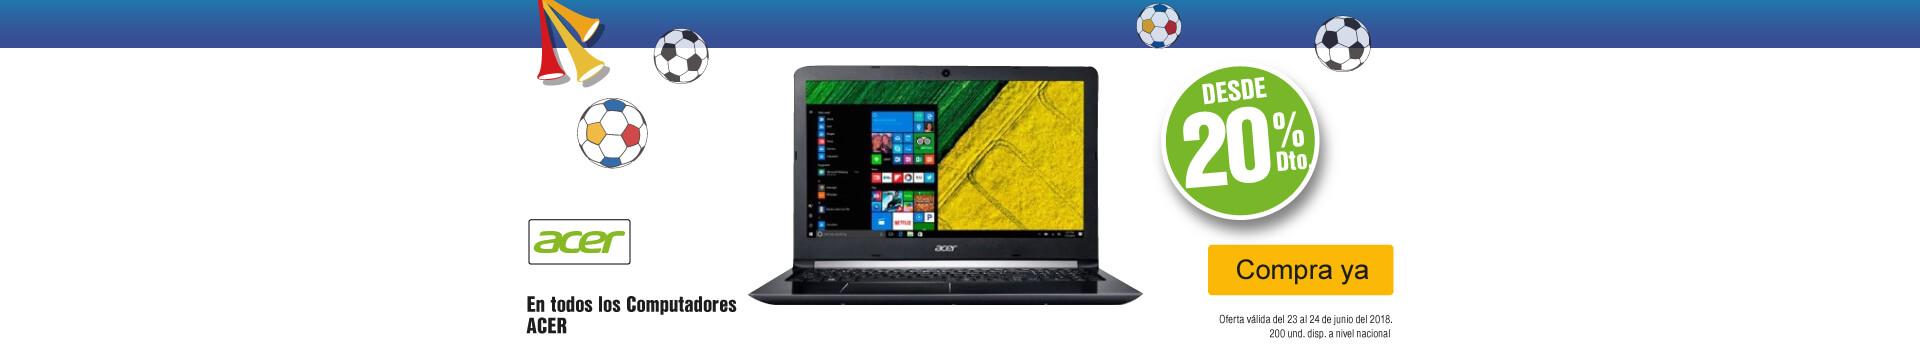 AK-KT-HIPER-3-computadores y tablets-DCAT---Acer-Desde 20% Dto.en Computadores-Jun23